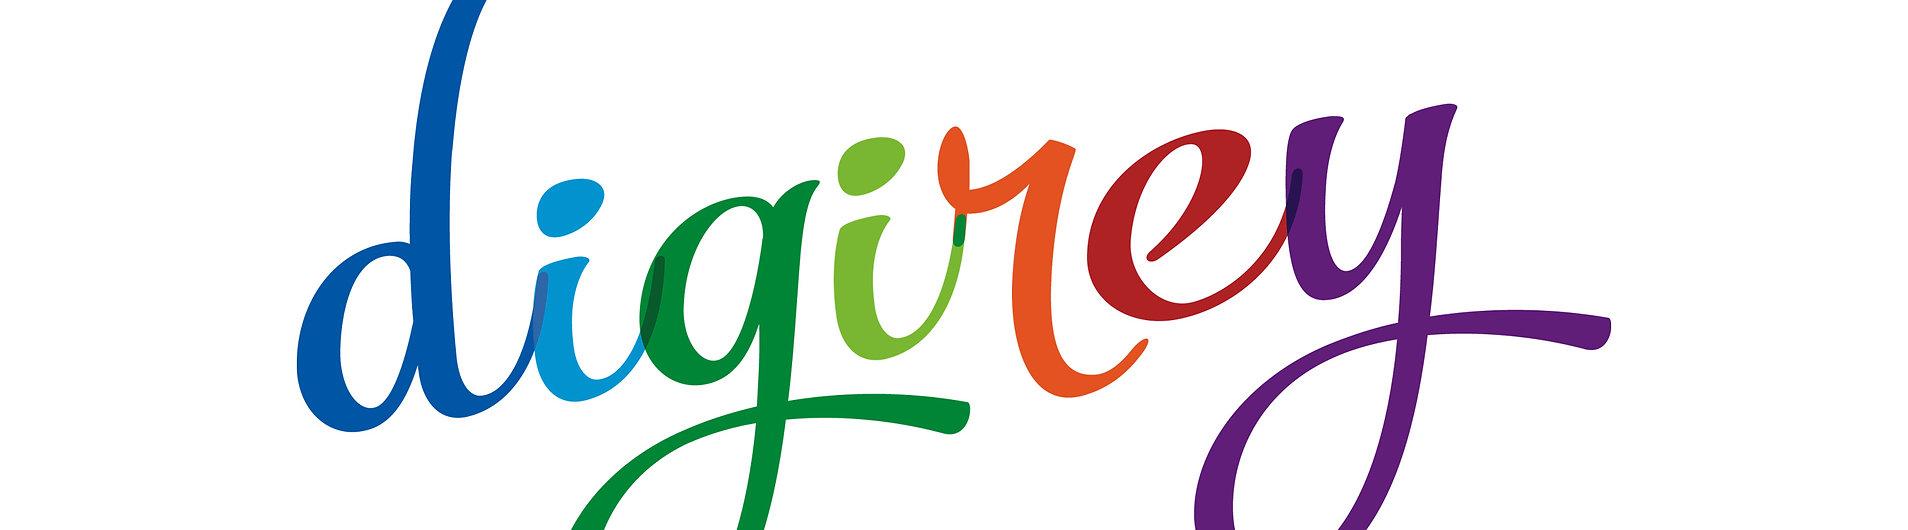 Logos_Stories_Digirey only.jpg